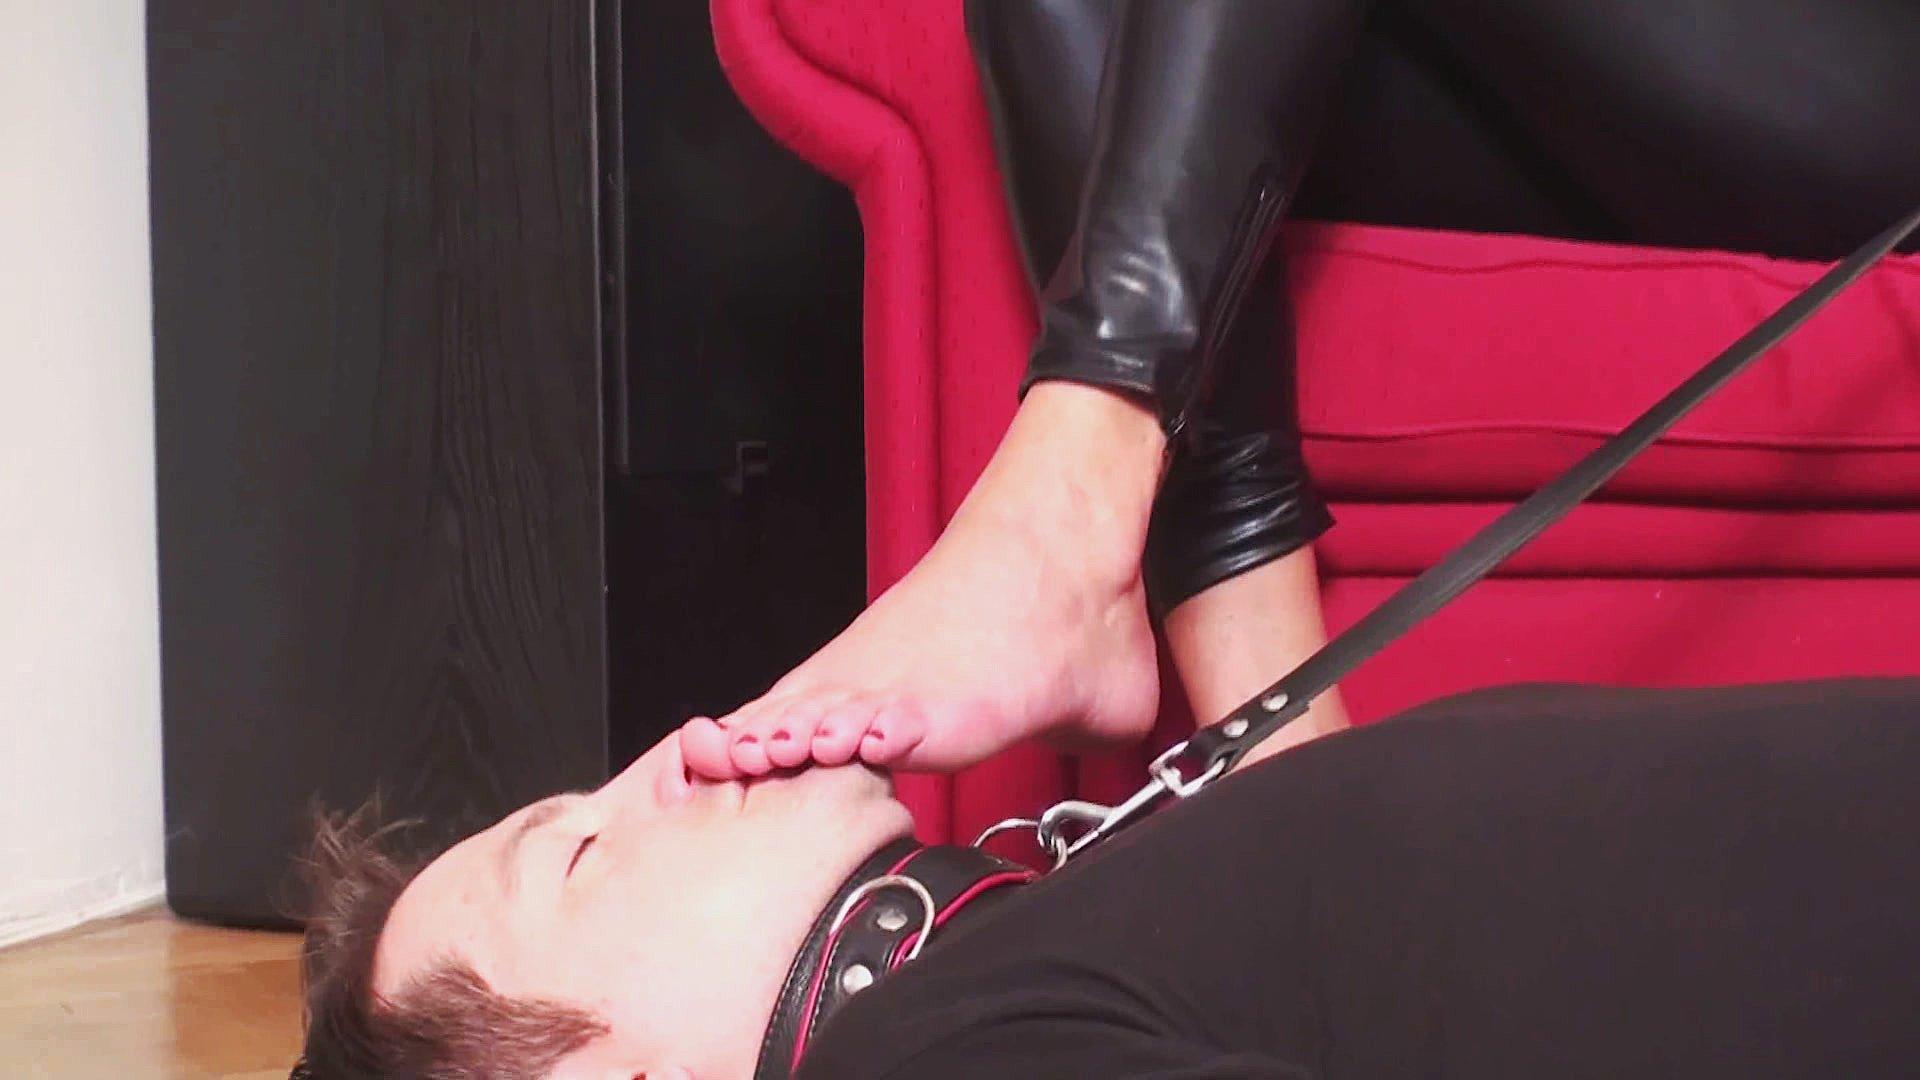 Slaves licking feet